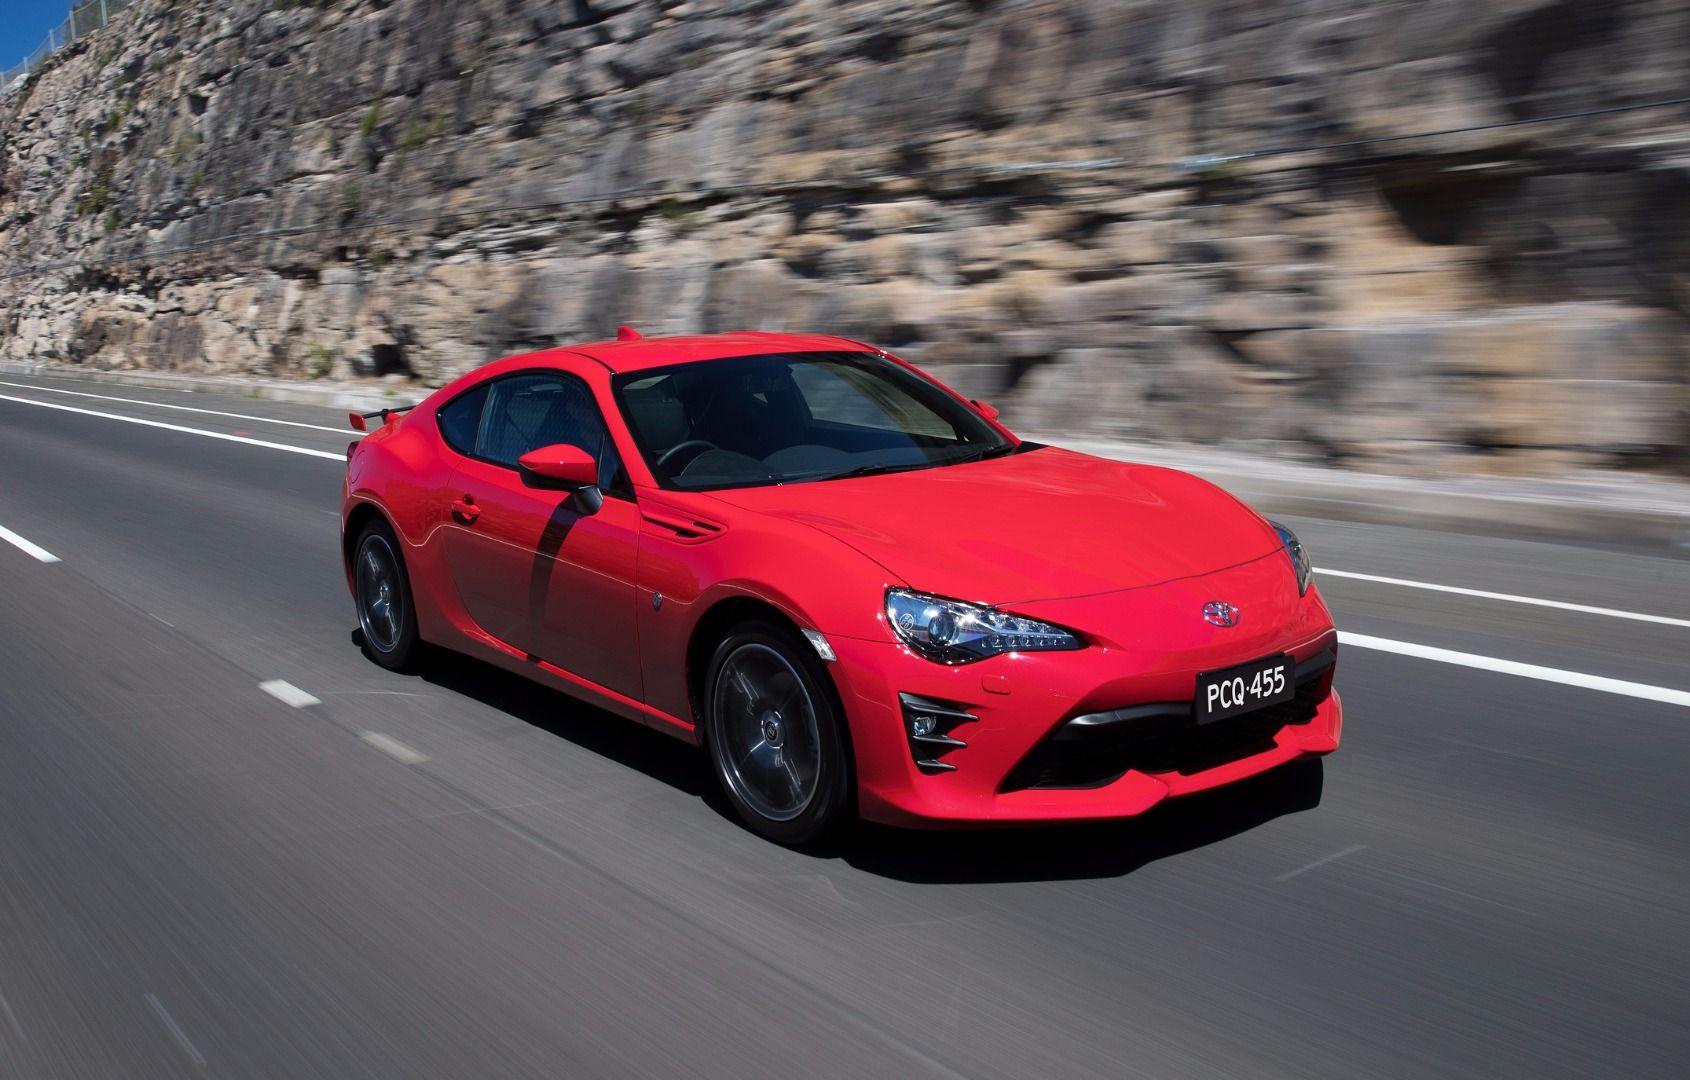 review 2017 toyota 86 review carshowroom com au cars pinterest rh pinterest com